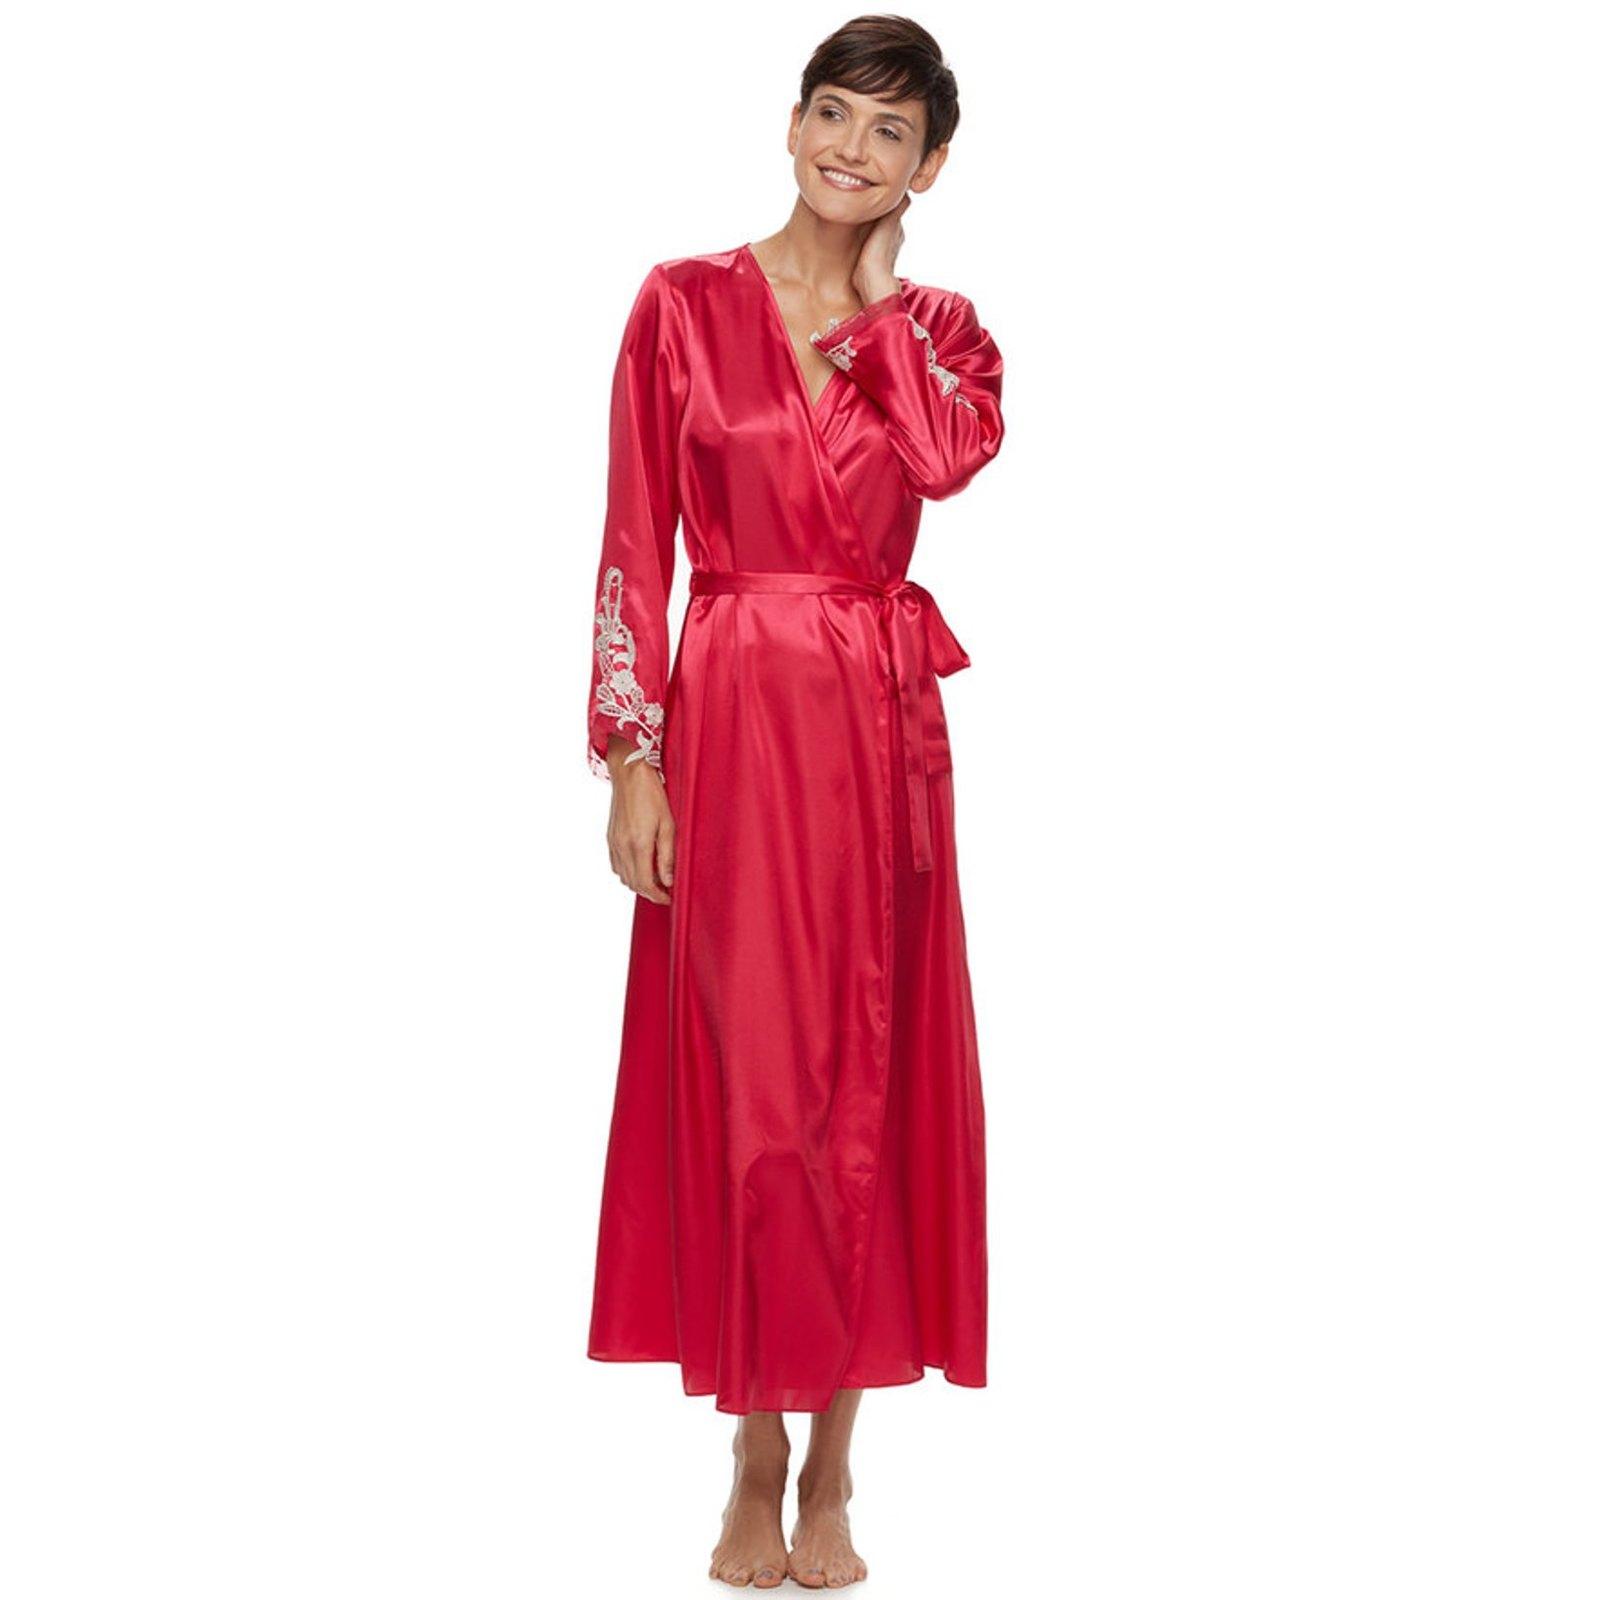 5480660a4d46 Flora Nikrooz Womens L Crimson Red Charmeuse Robe & Gown Sleepwear Set New  $126